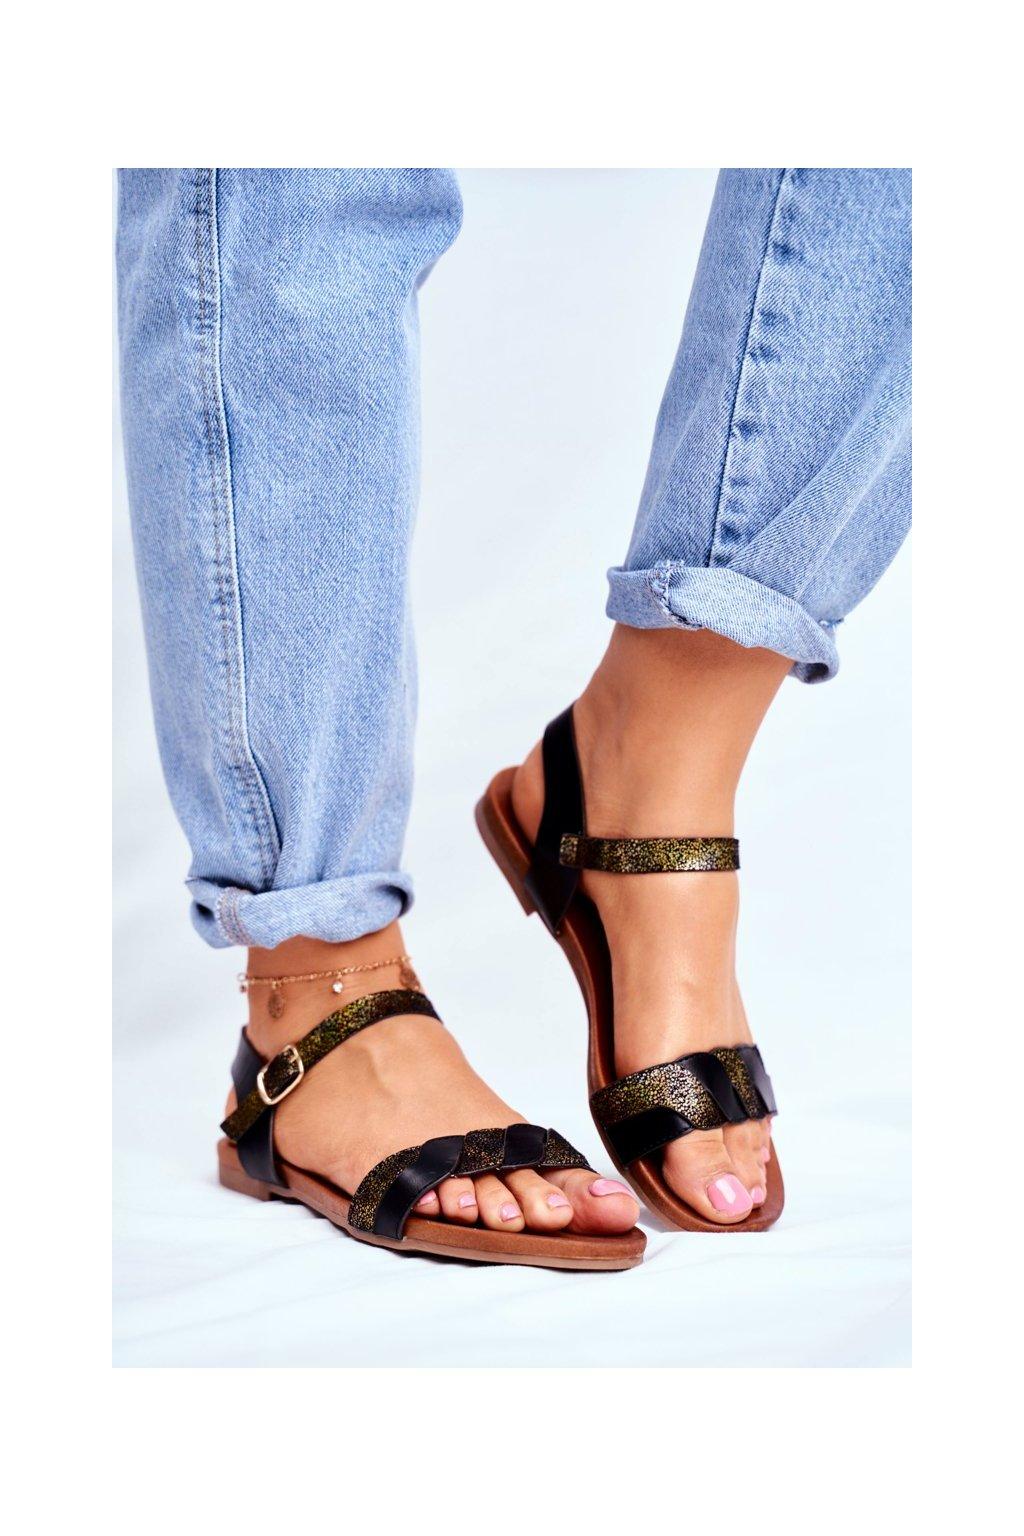 Dámske sandále s plochou podrážkou farba čierna kód obuvi 541-144 BLK